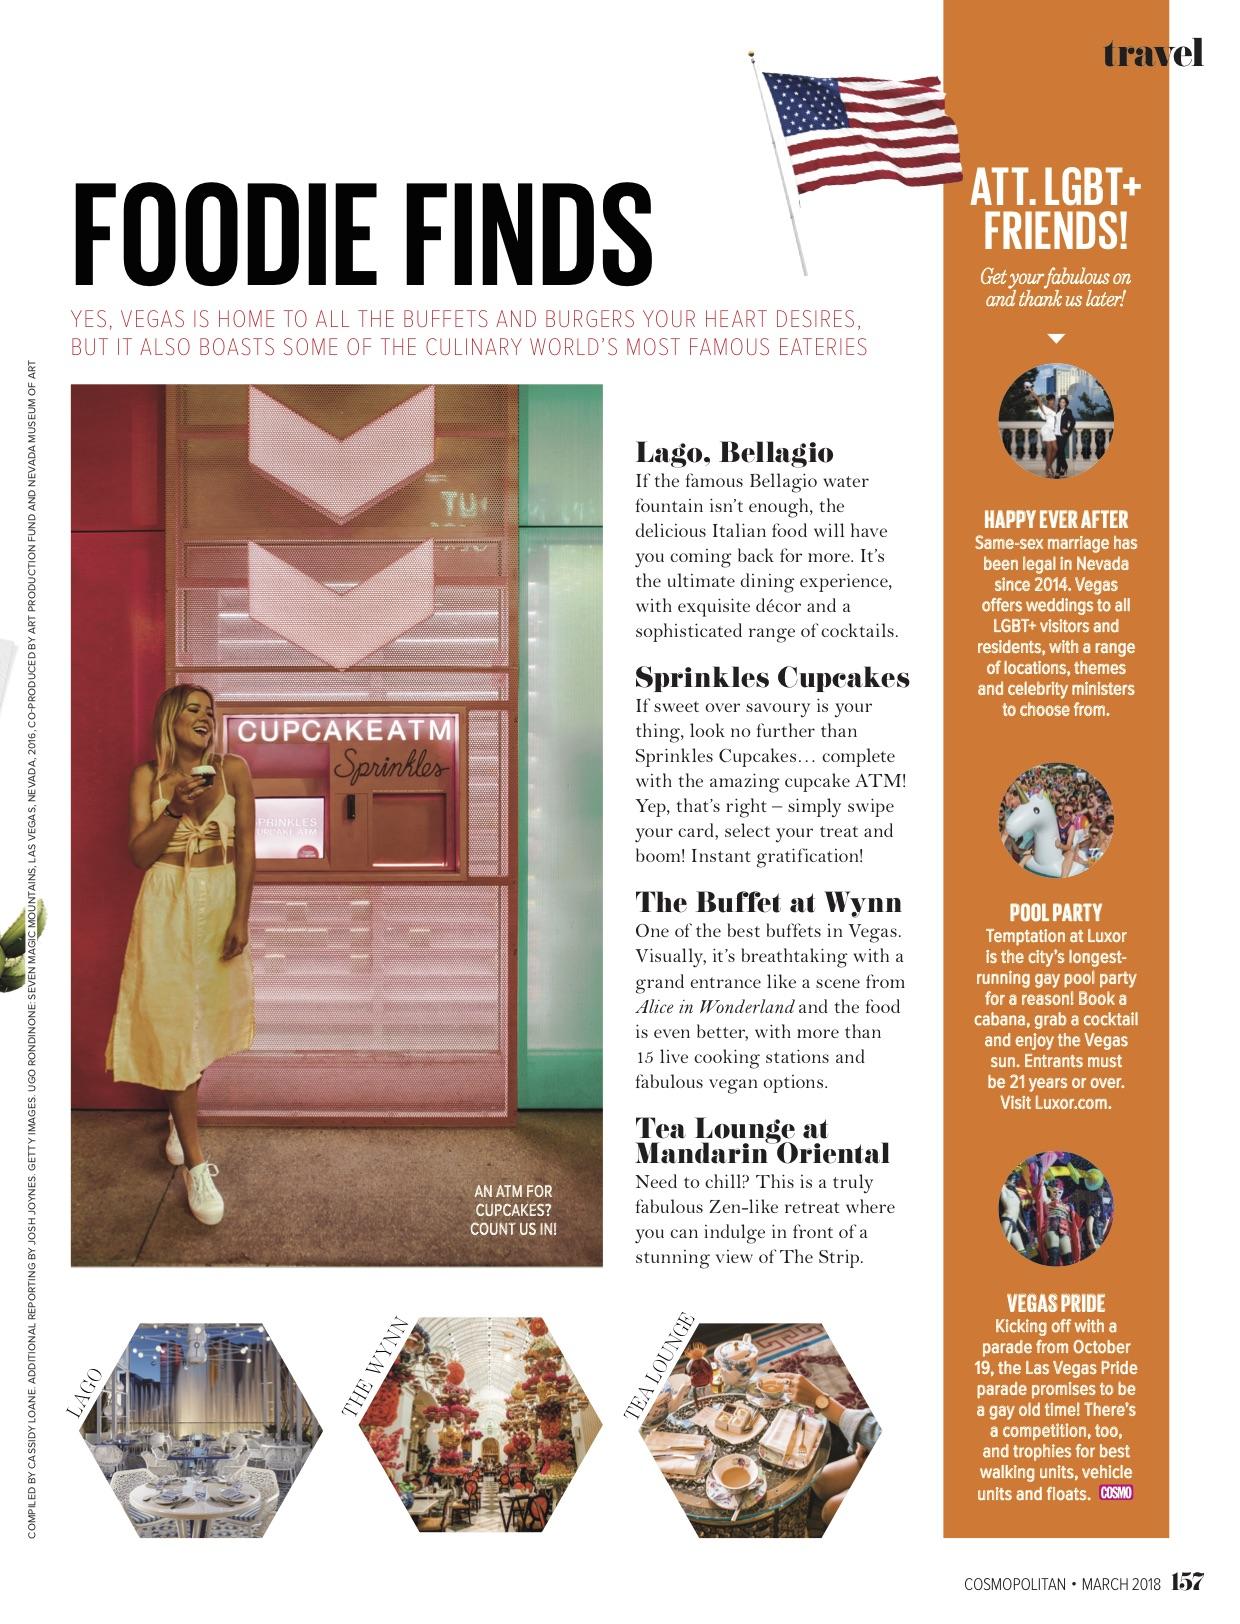 Vegas Travel Cosmopolitan Magazine